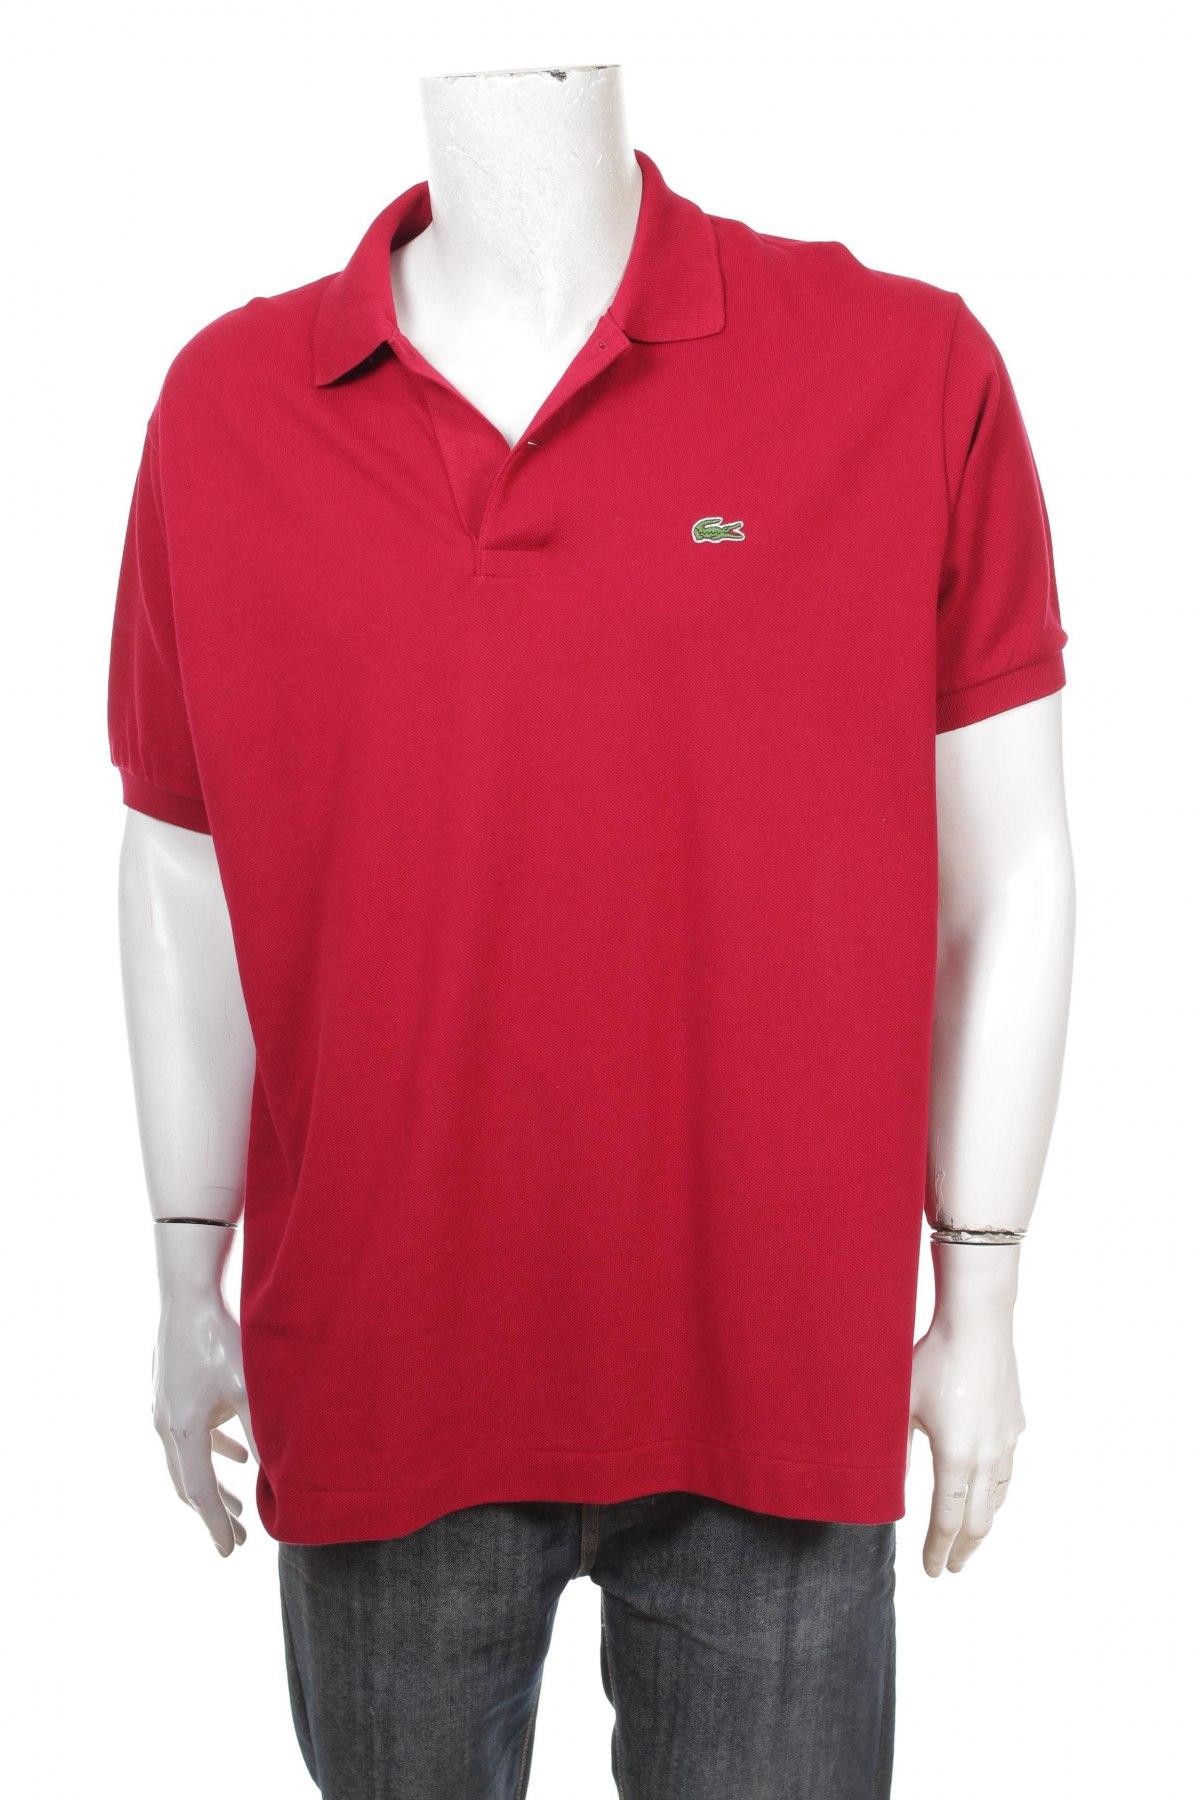 06fb76576ad4 Ανδρικό t-shirt Lacoste - σε συμφέρουσα τιμή στο Remix -  8660973